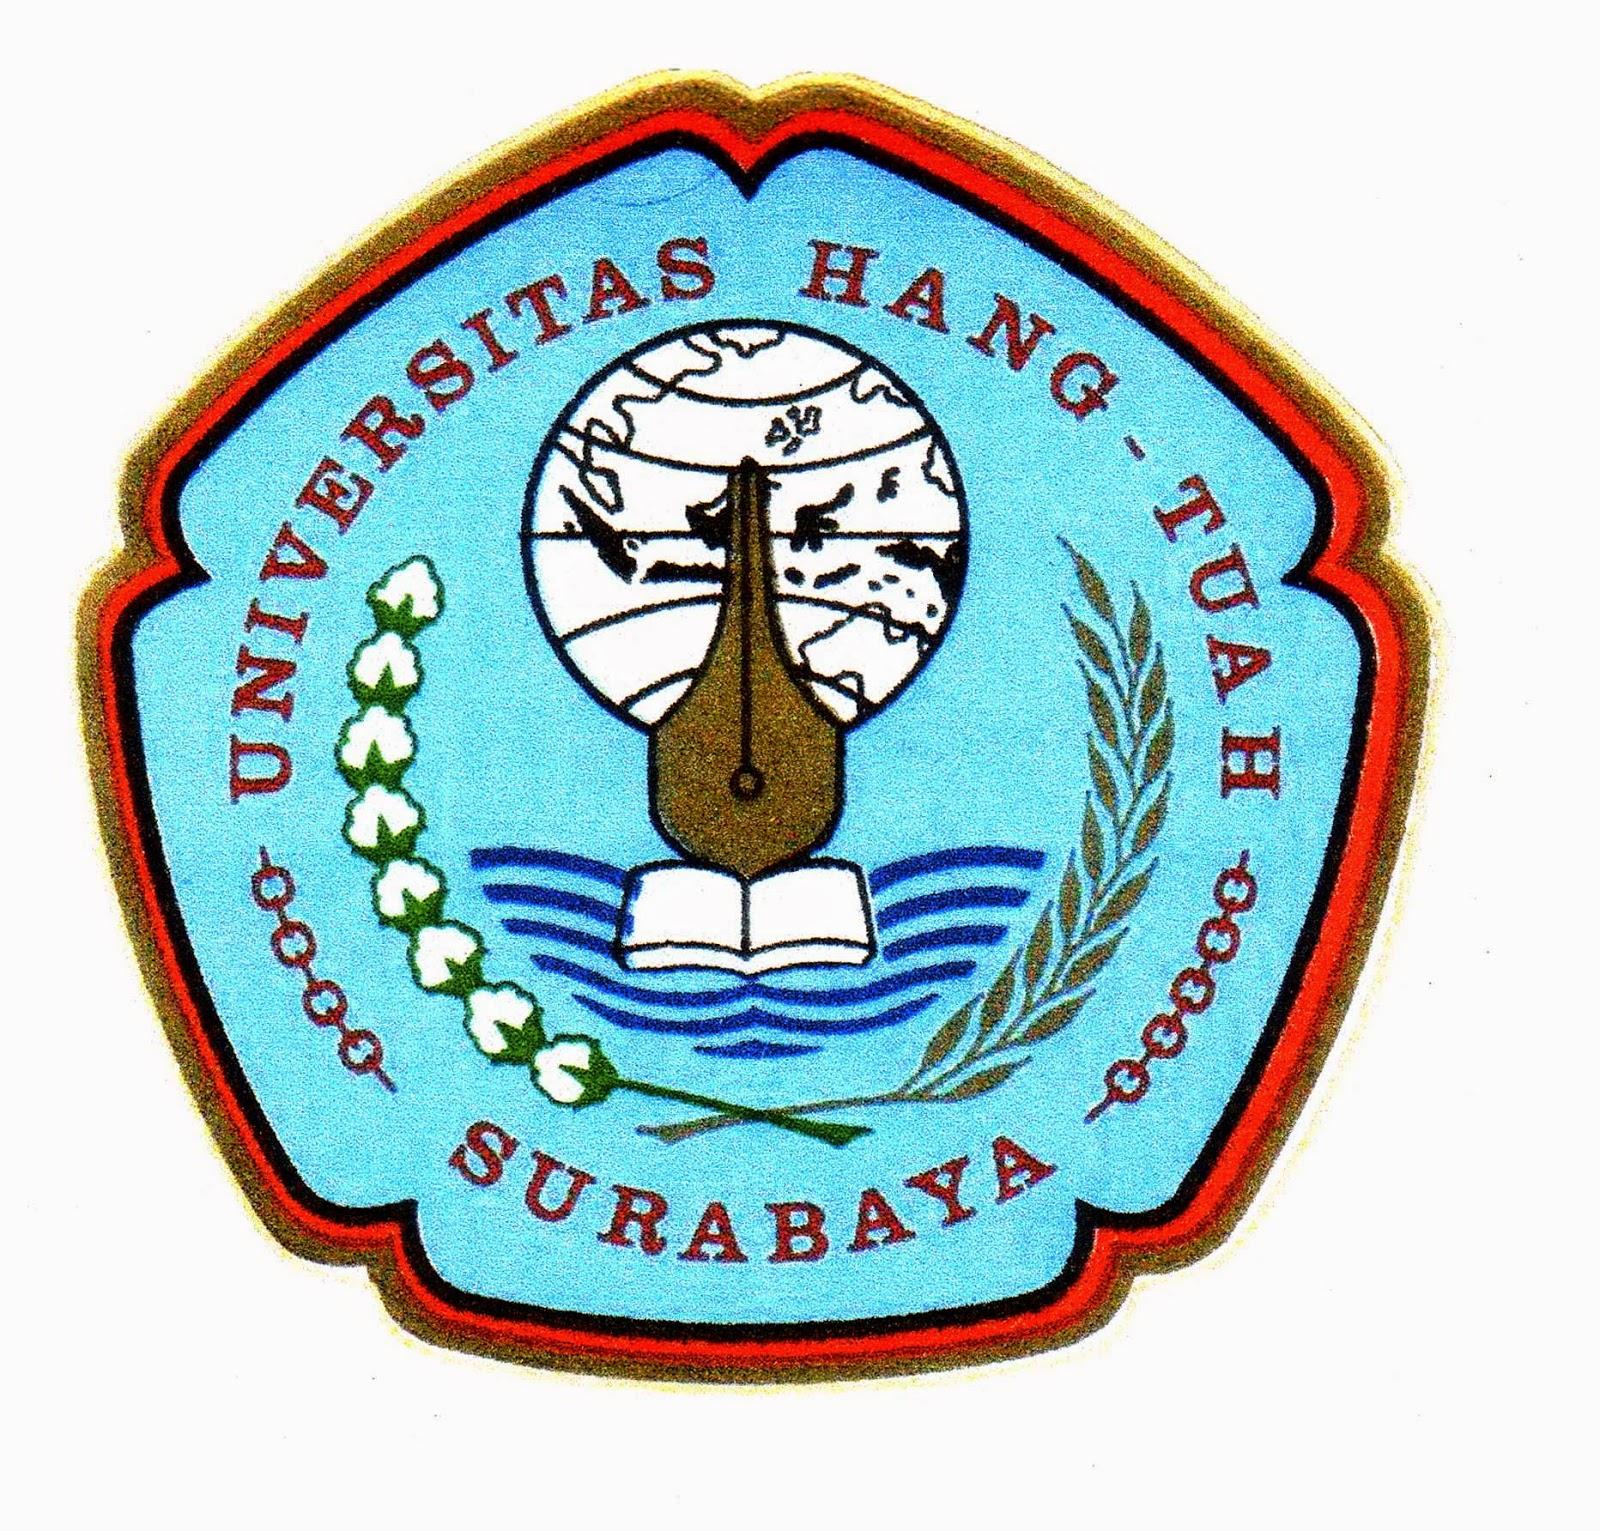 FRENDDAY LAWUTARA HANGTUAH SURABAYA